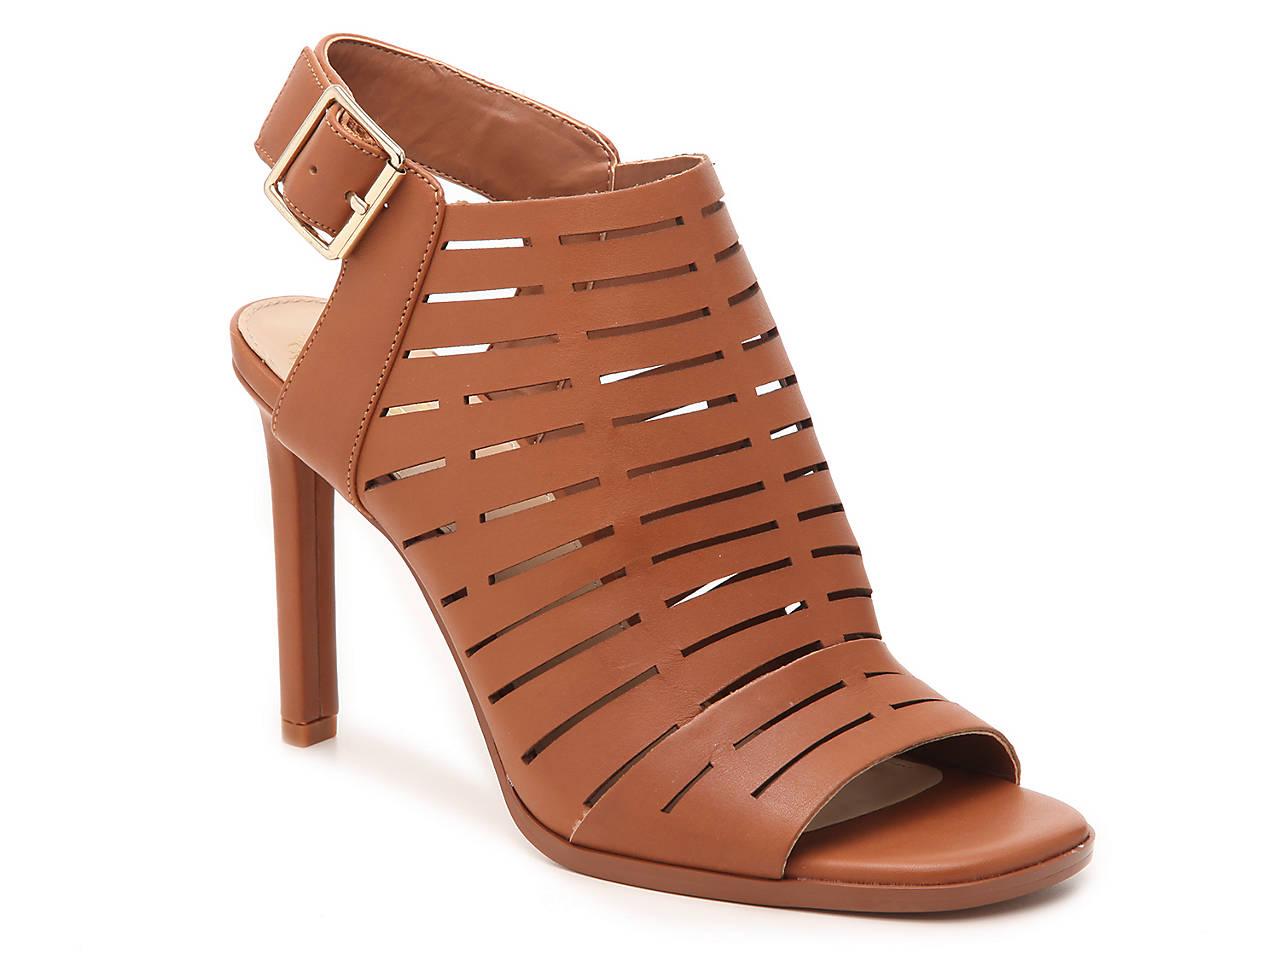 Jaxline Sandal by Vince Camuto